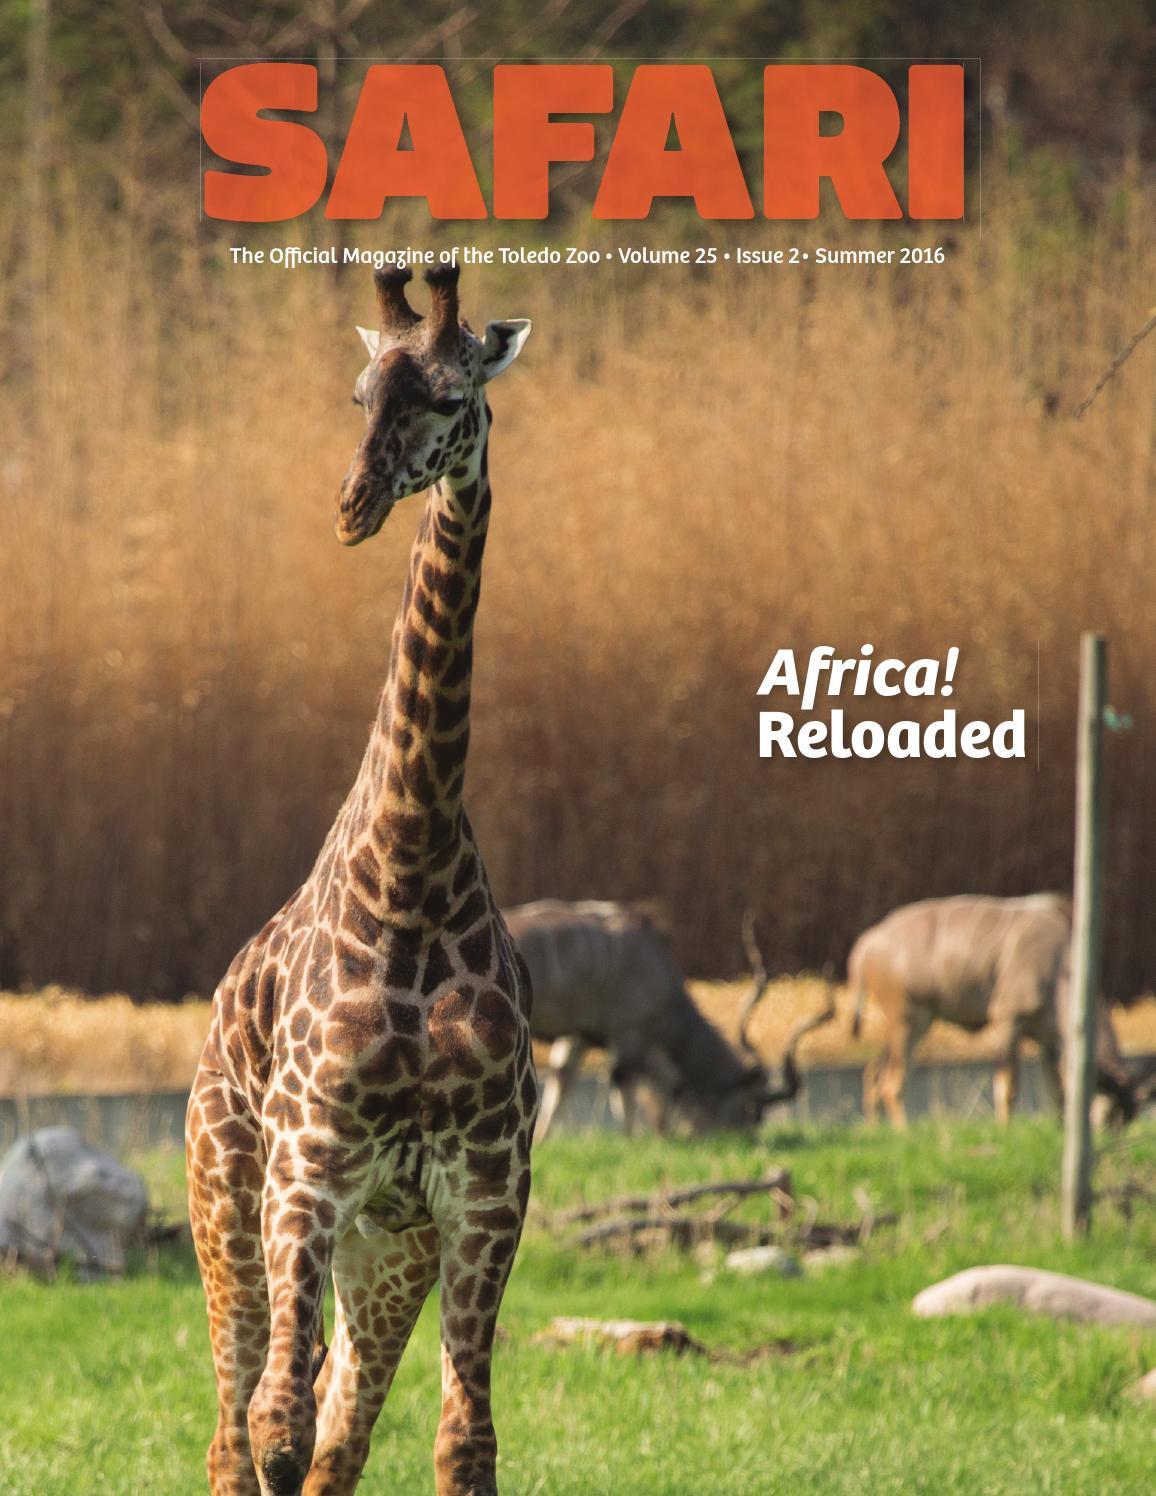 spring safari by safari magazine the toledo zoo issuu toledo zoo safari summer 2016